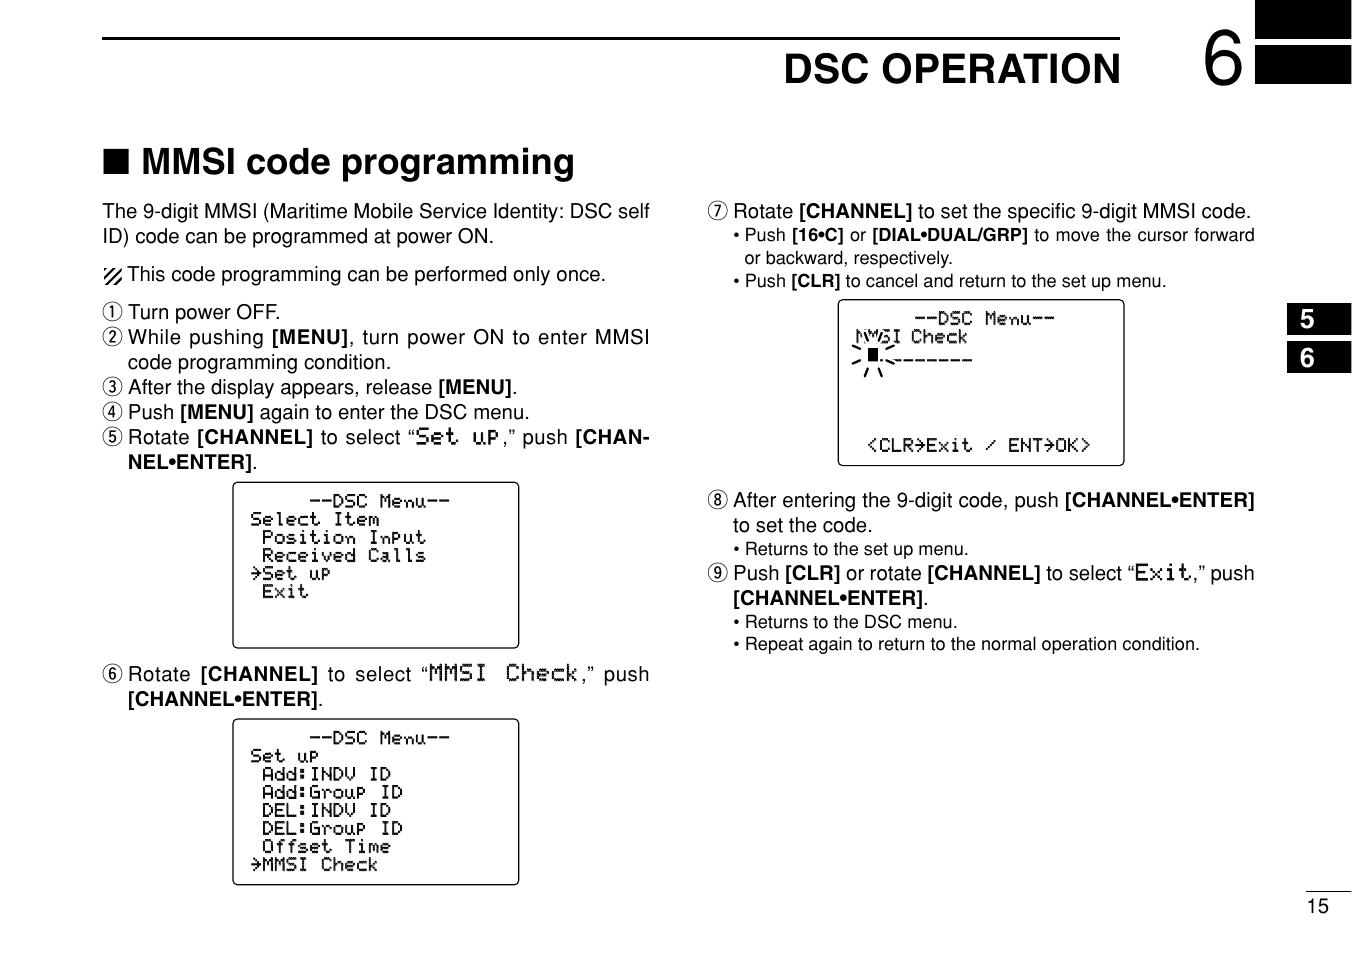 dsc operation mmsi code programming icom ic m505 user manual rh manualsdir com icom m505 user manual icom ic-m505 service manual